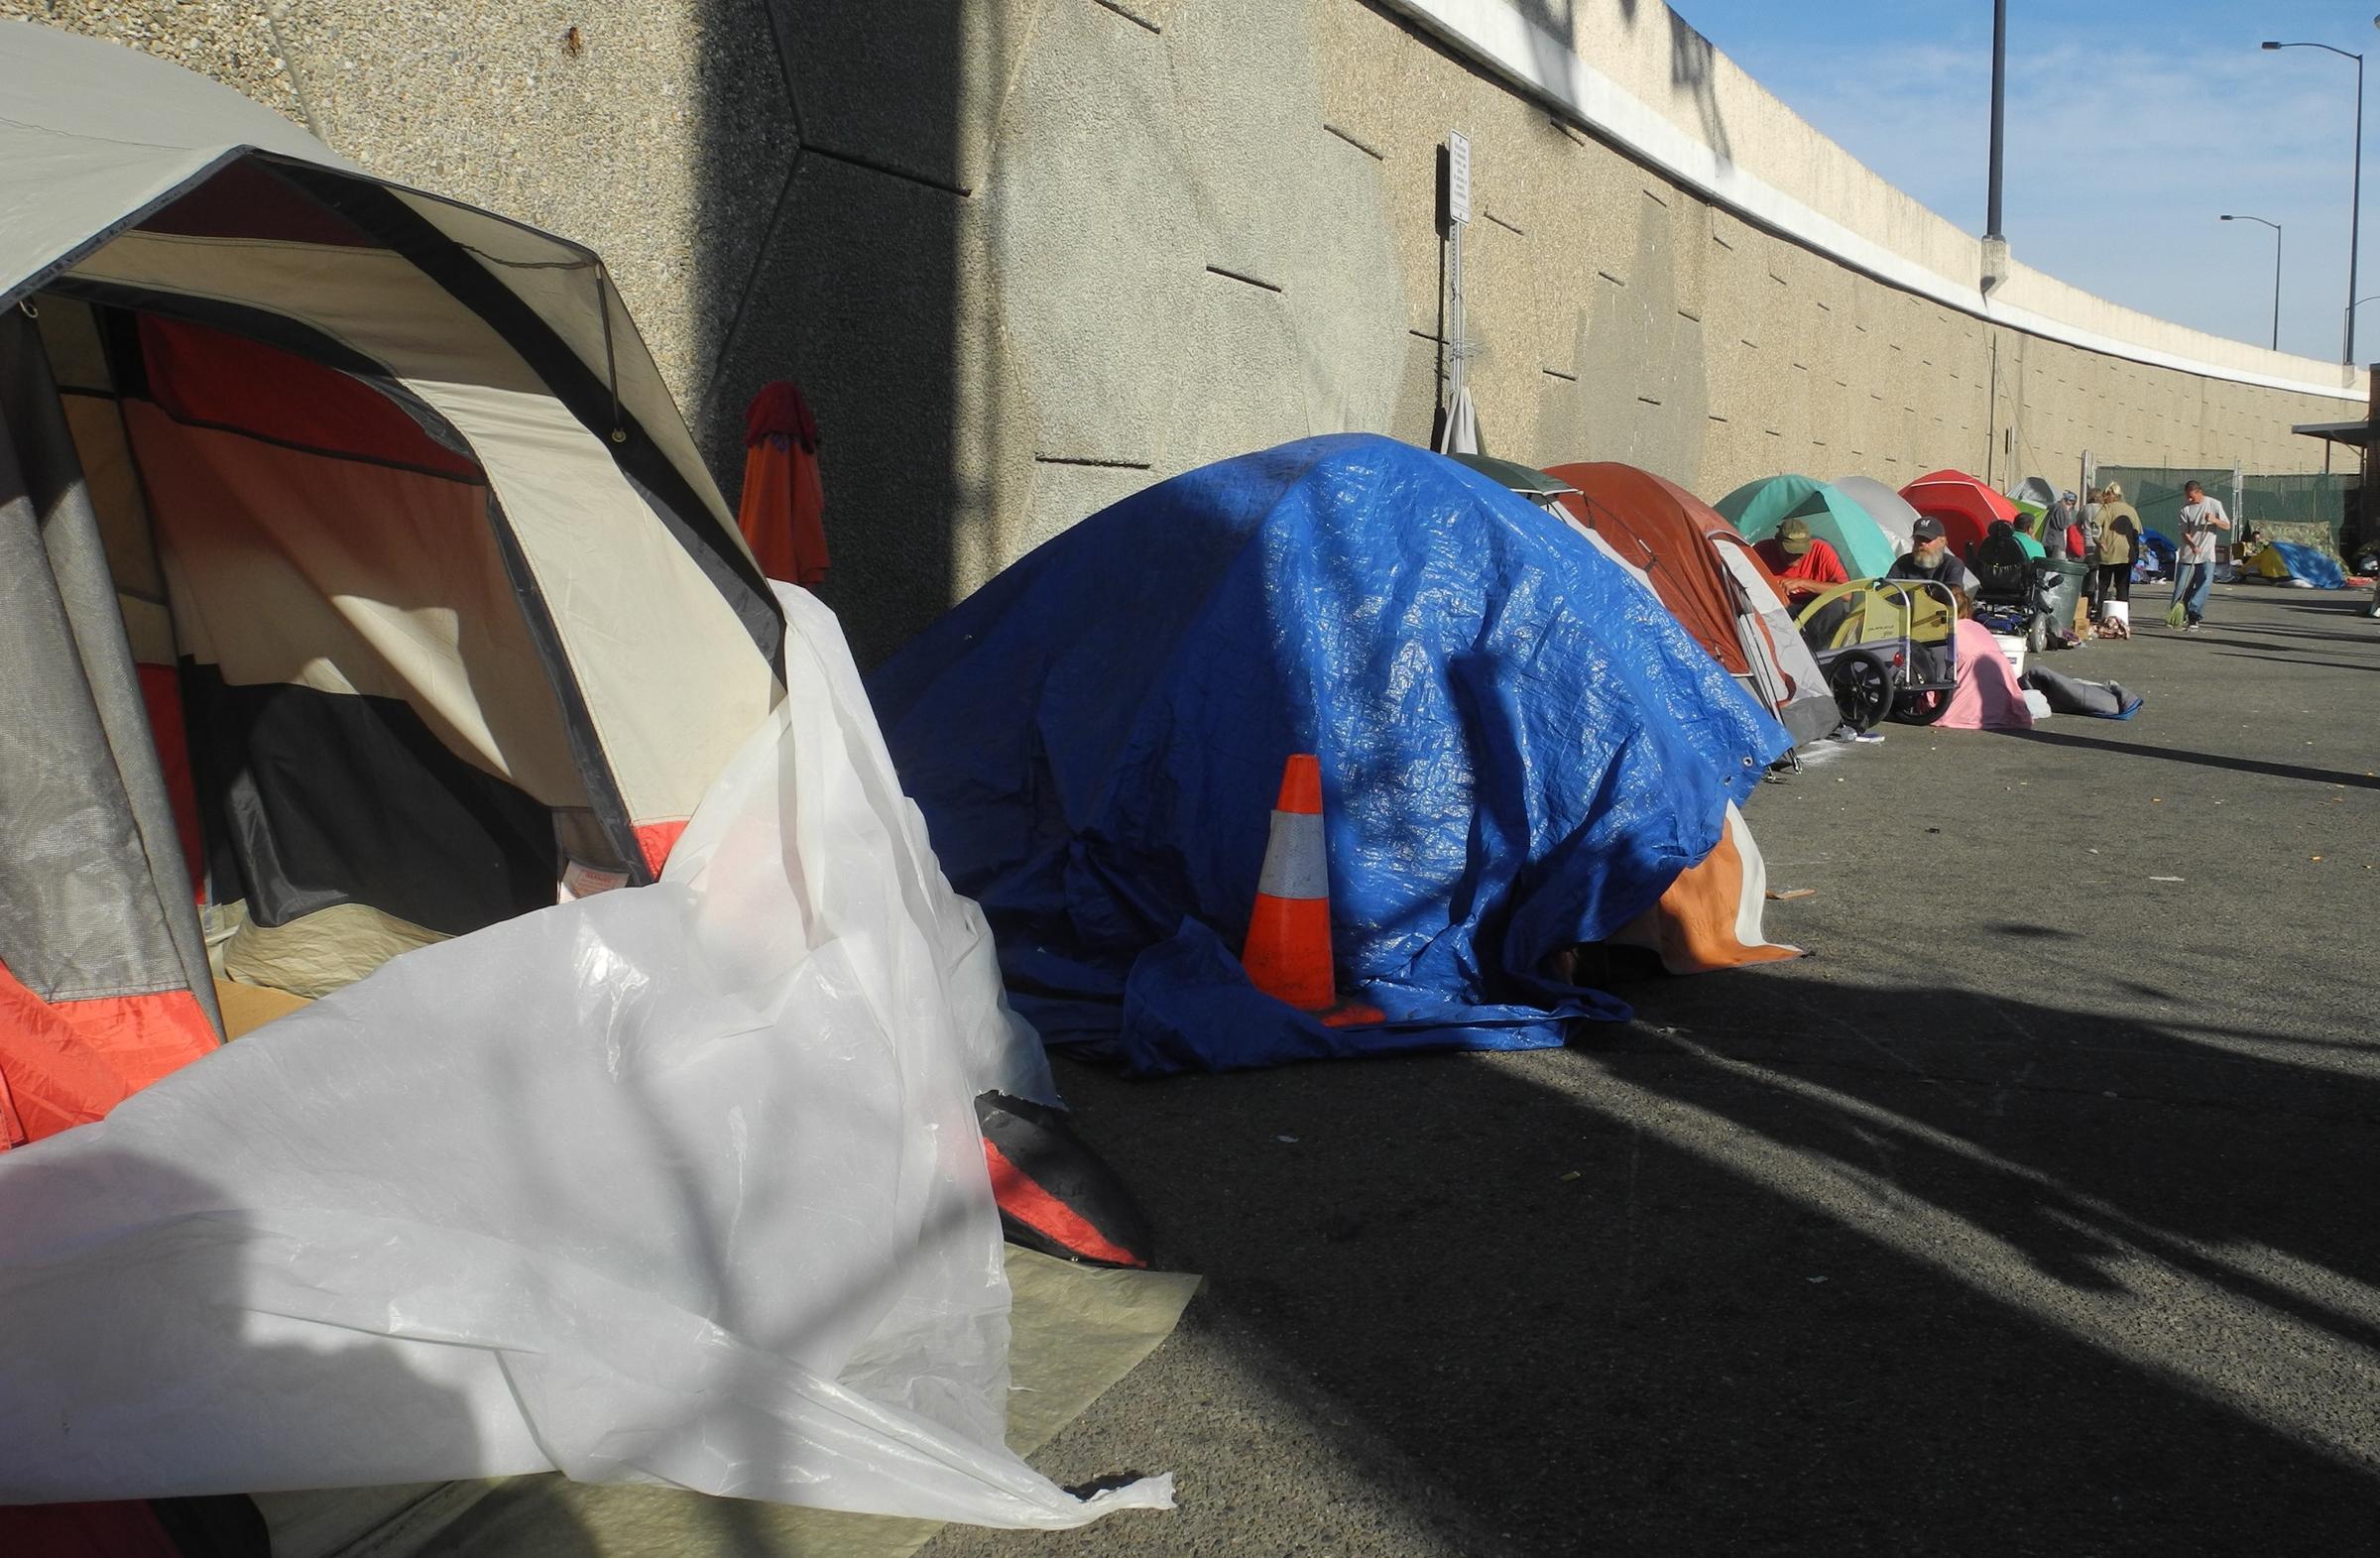 View Slideshow 1 of 13 & Slideshow: Life Inside Boiseu0027s Tent City | Boise State Public Radio